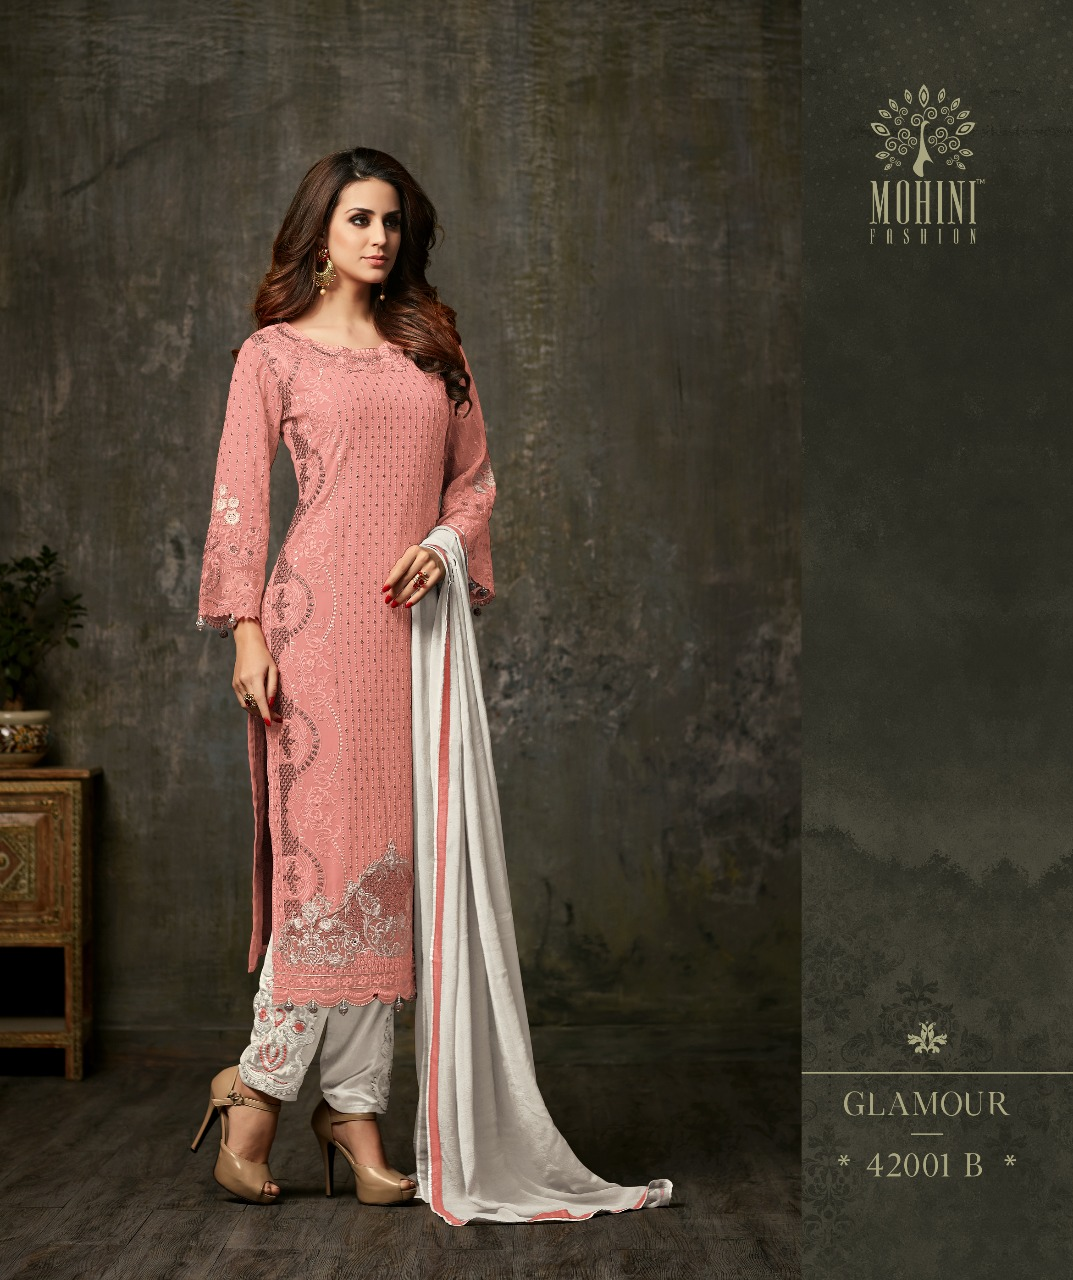 Mohini Fashion Glamour Vol 42 42001B PINK